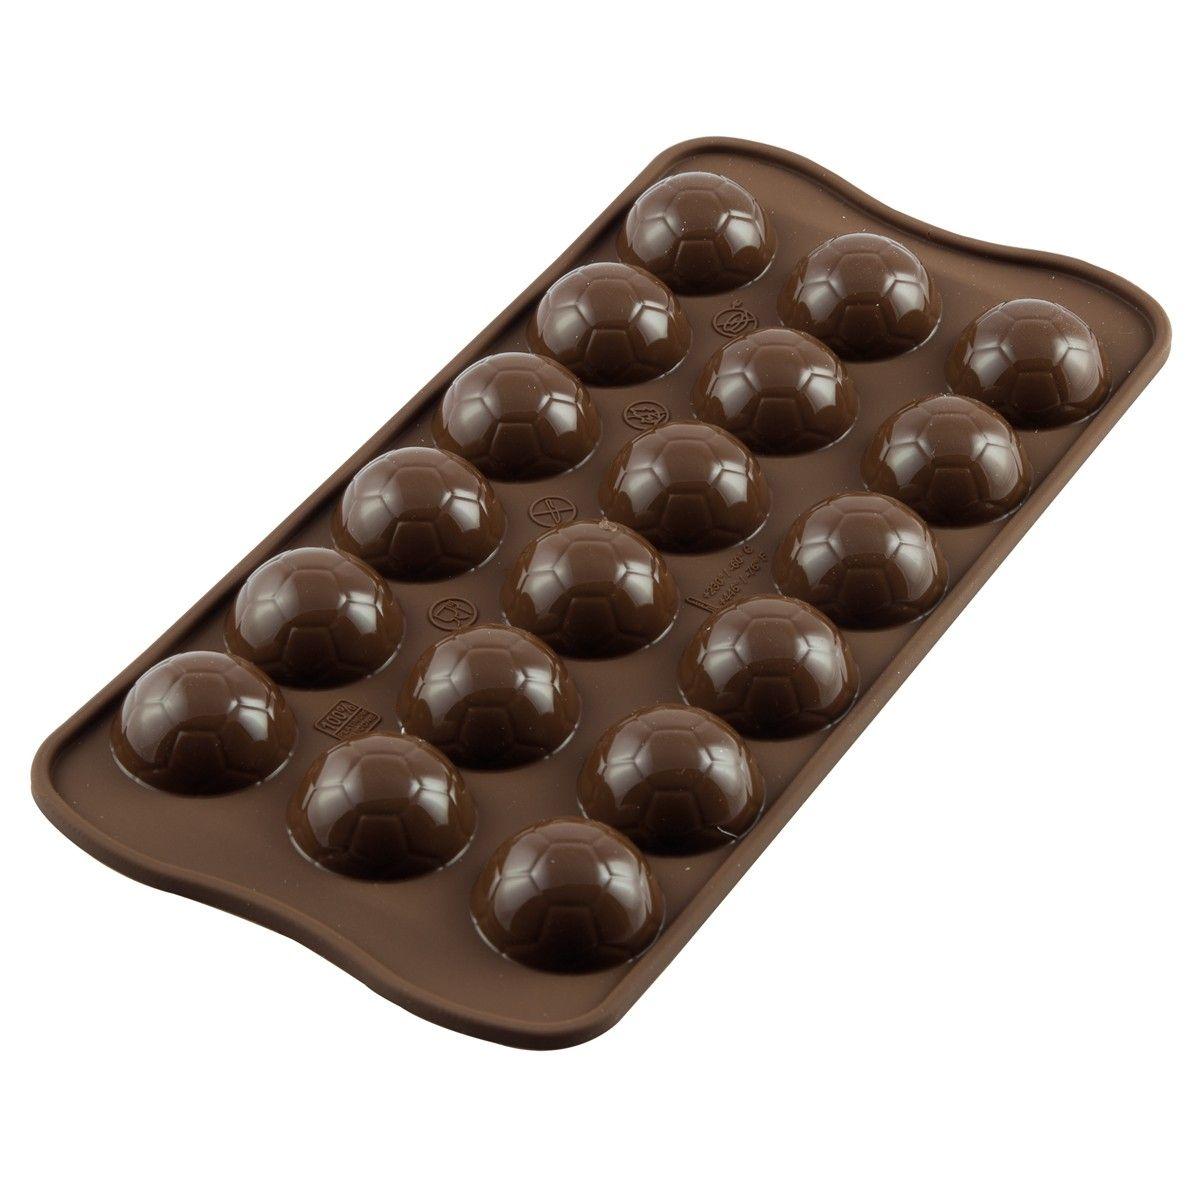 Silikomart Chokolate form Choco Goal